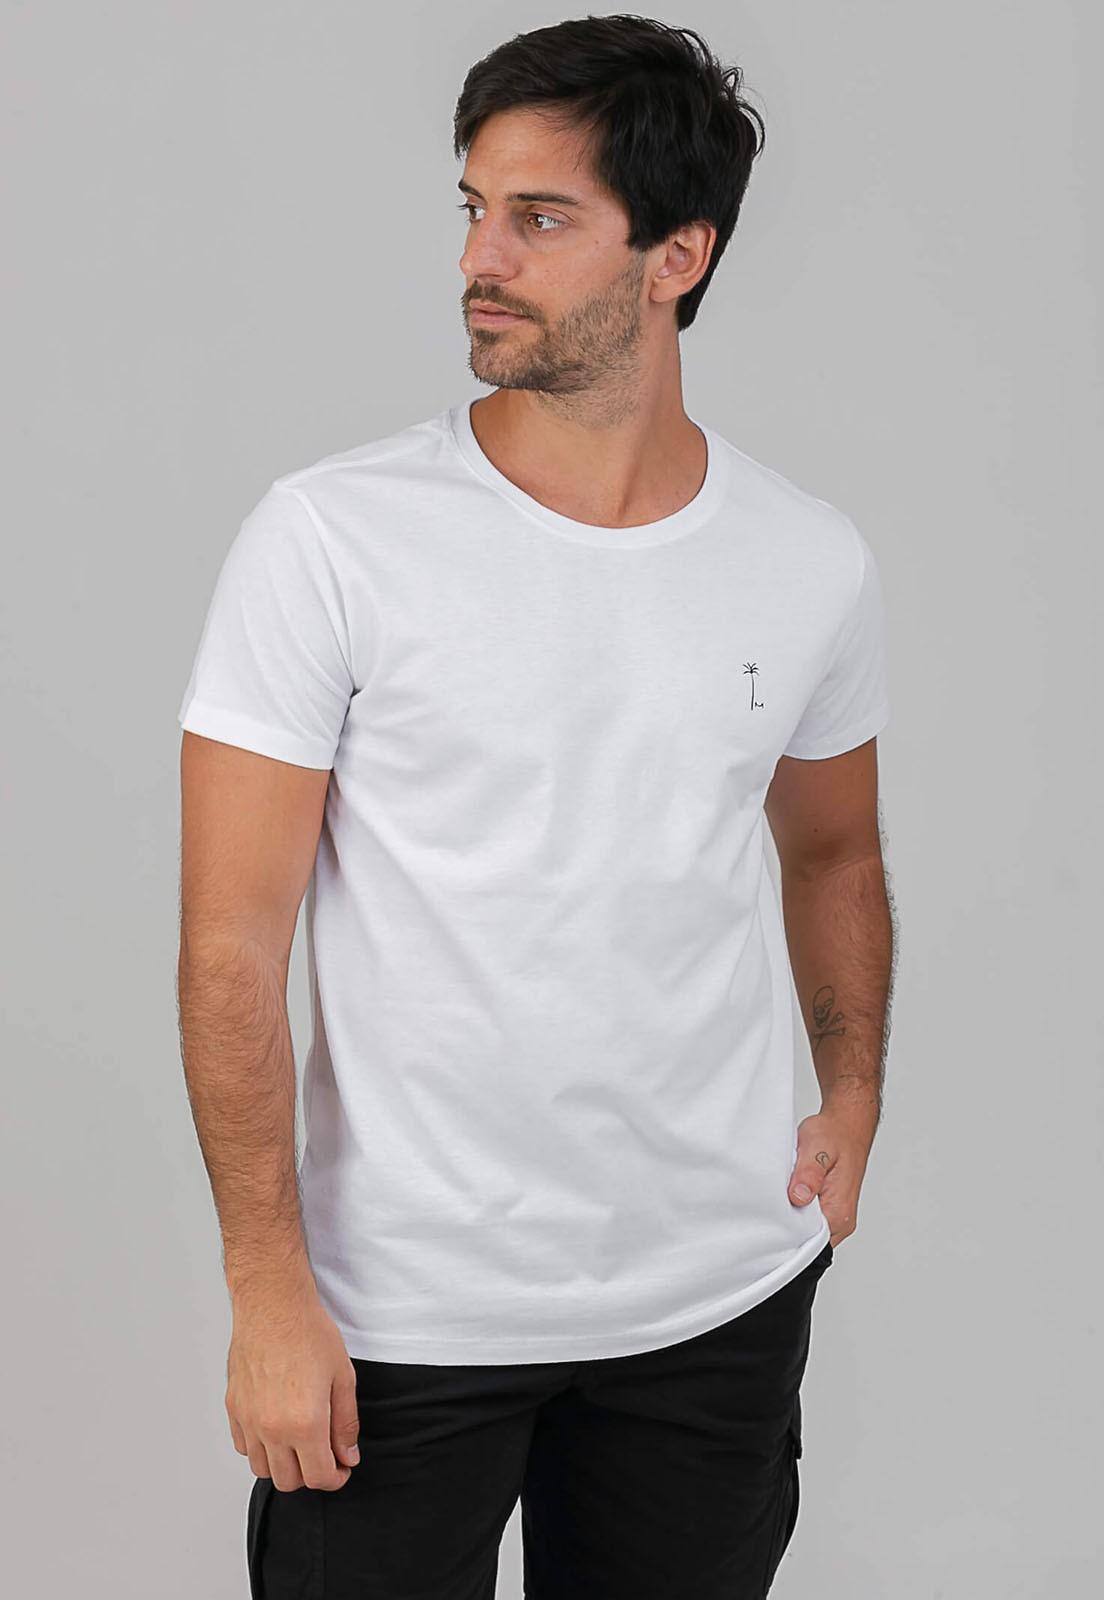 T-shirt Real Hapiness melty